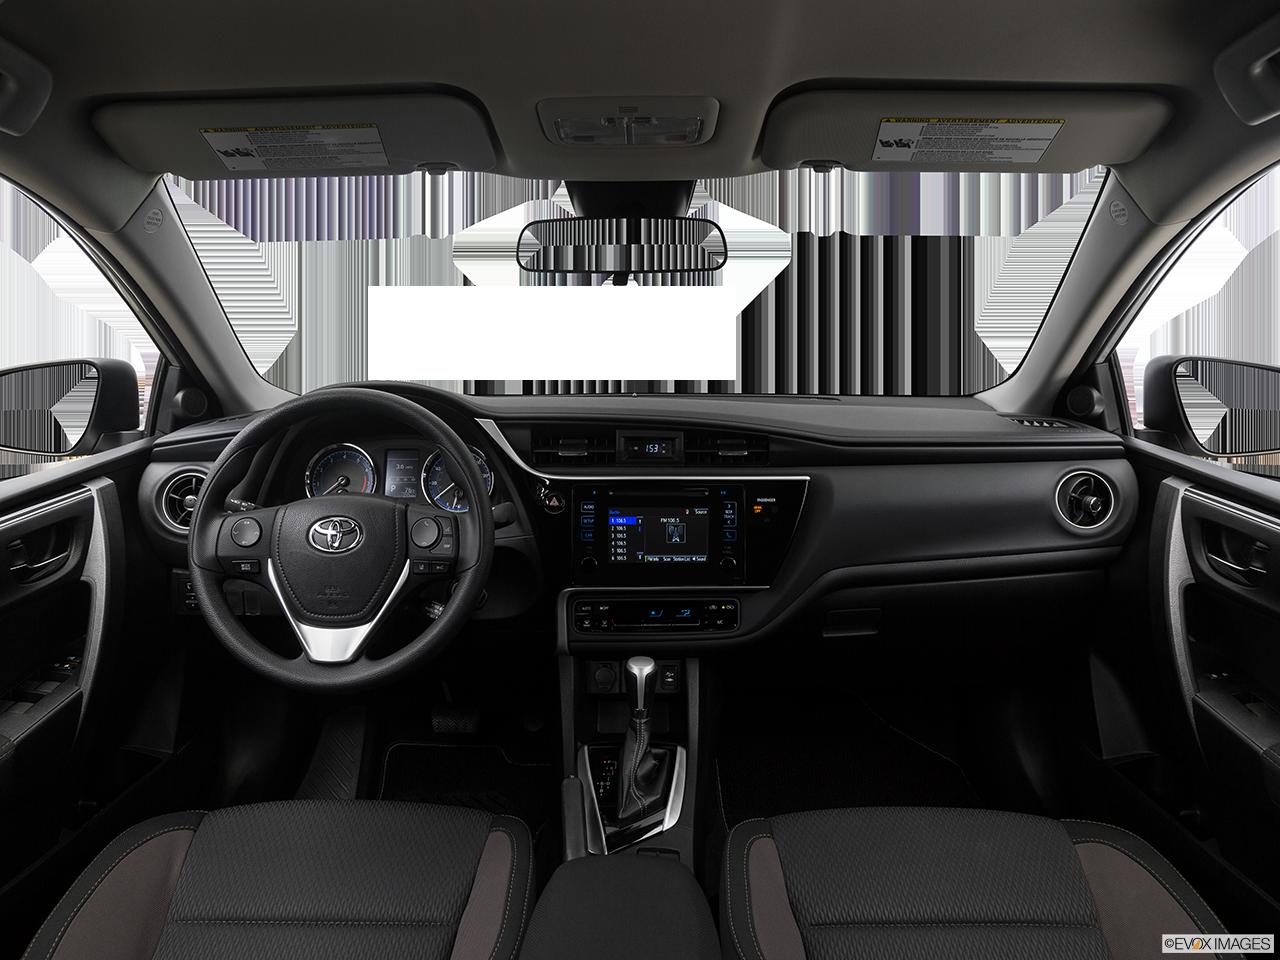 Interior View Of 2017 Toyota Corolla Riverside